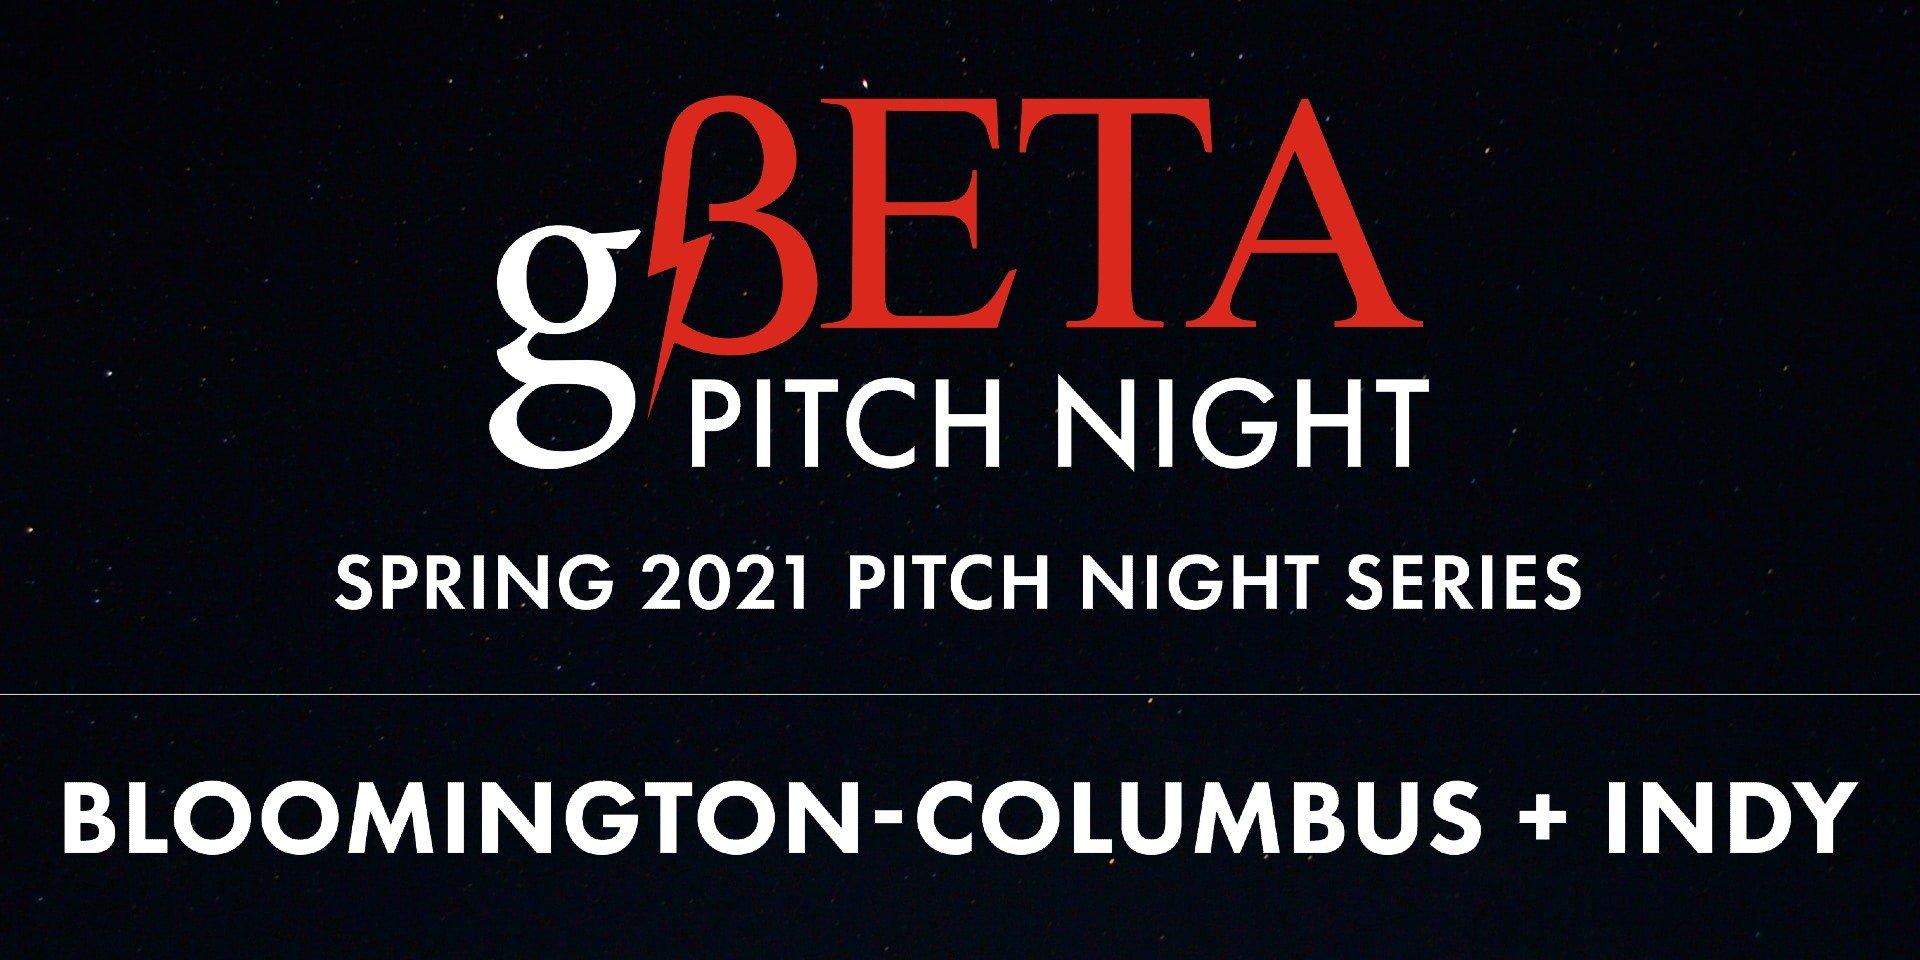 gBeta Pitch Night banner